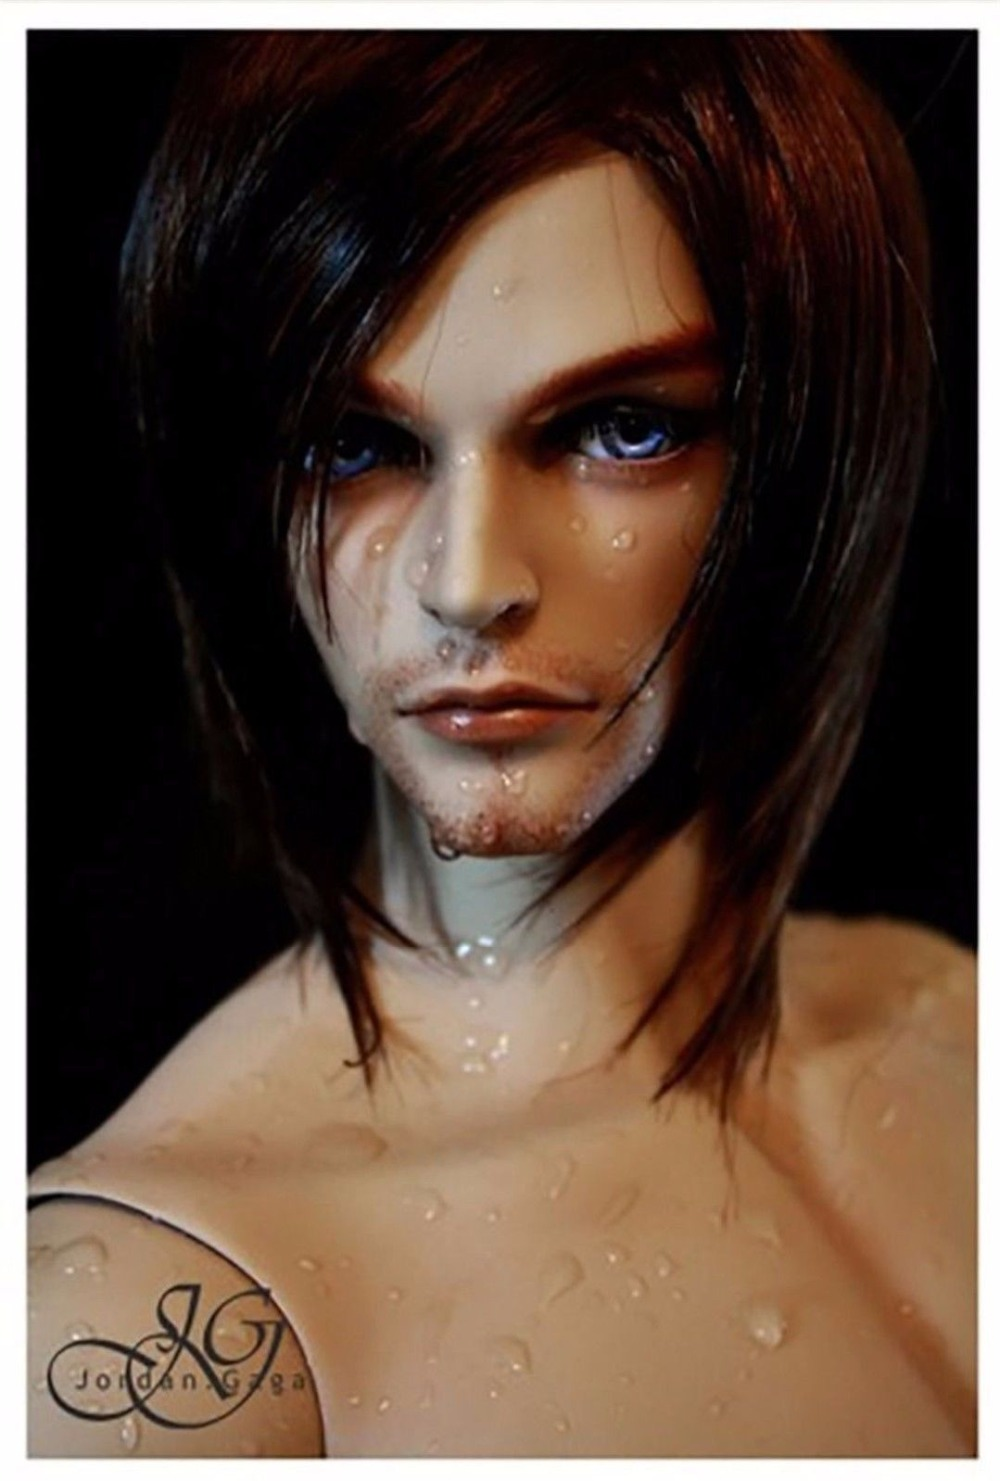 SuDoll BJD Doll Attractive Boy bjd sd doll toy 1/3 кукла bjd dc doll chateau 6 bjd sd doll zora soom volks